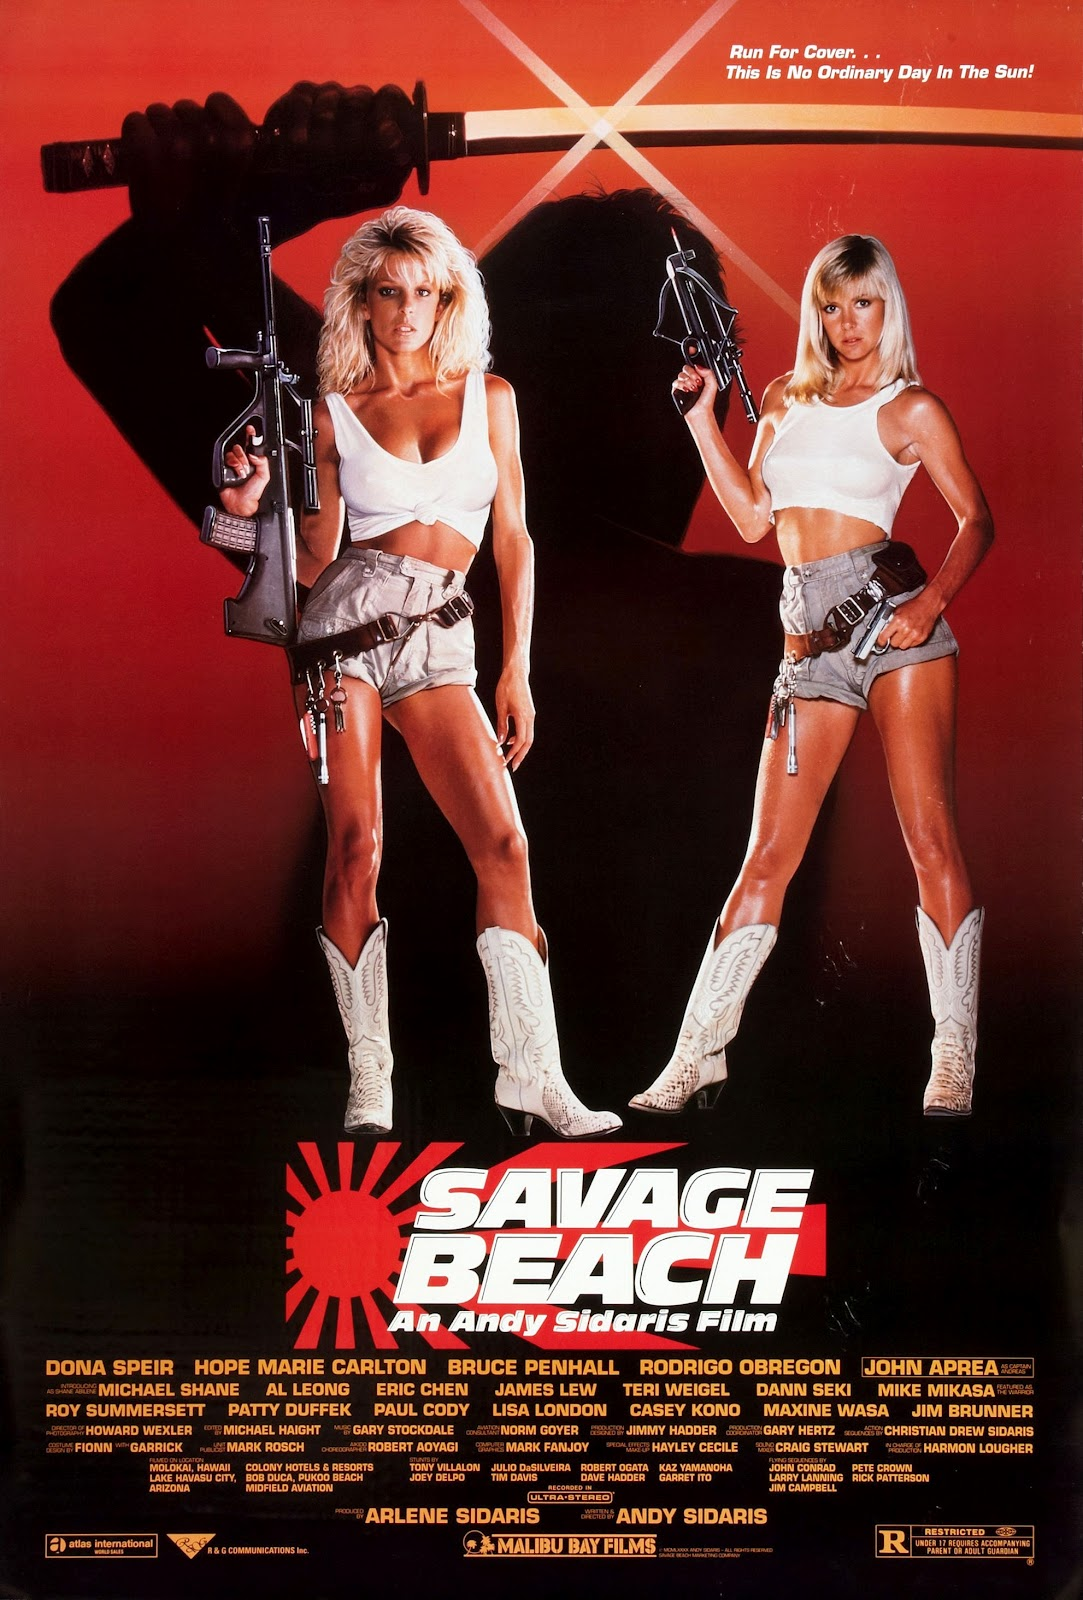 http://2.bp.blogspot.com/-n4G95dwt50s/TzdU_R1qWvI/AAAAAAAAFxo/mdc3EMwQHkc/s1600/Savage+Beach.jpg